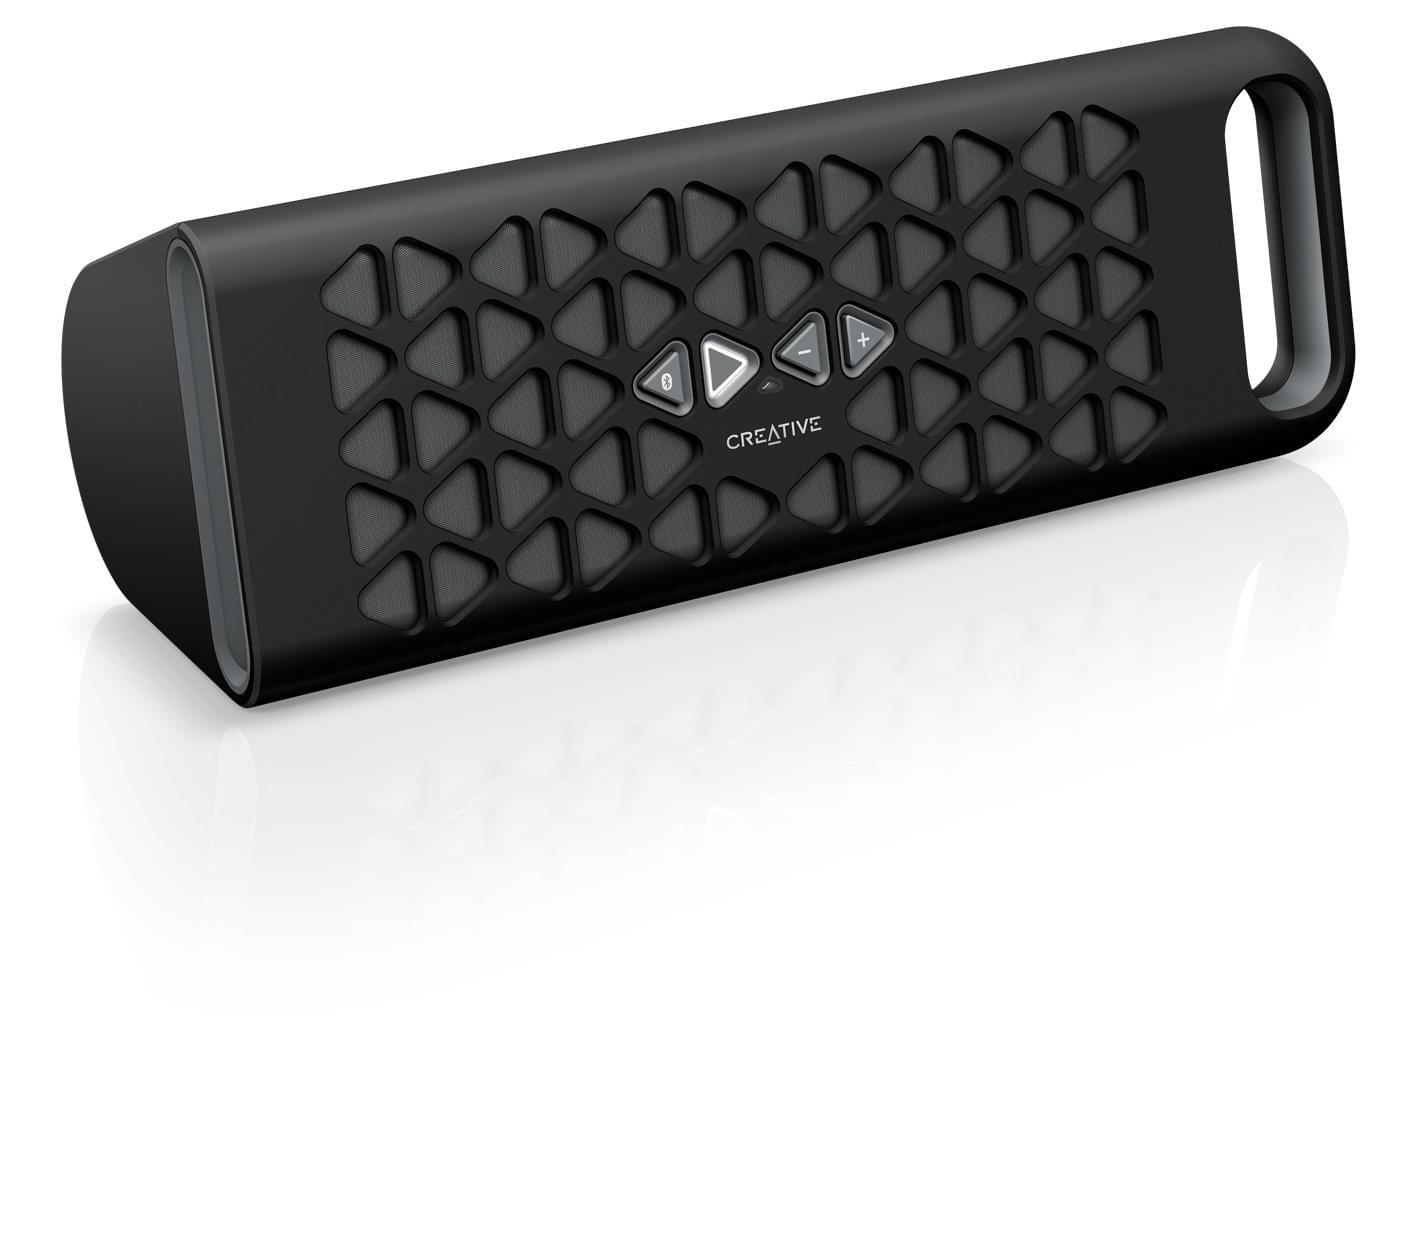 Creative Muvo 10 Bluetooth Black (51MF8180AA000 soldé) - Achat / Vente Enceinte PC sur Cybertek.fr - 0